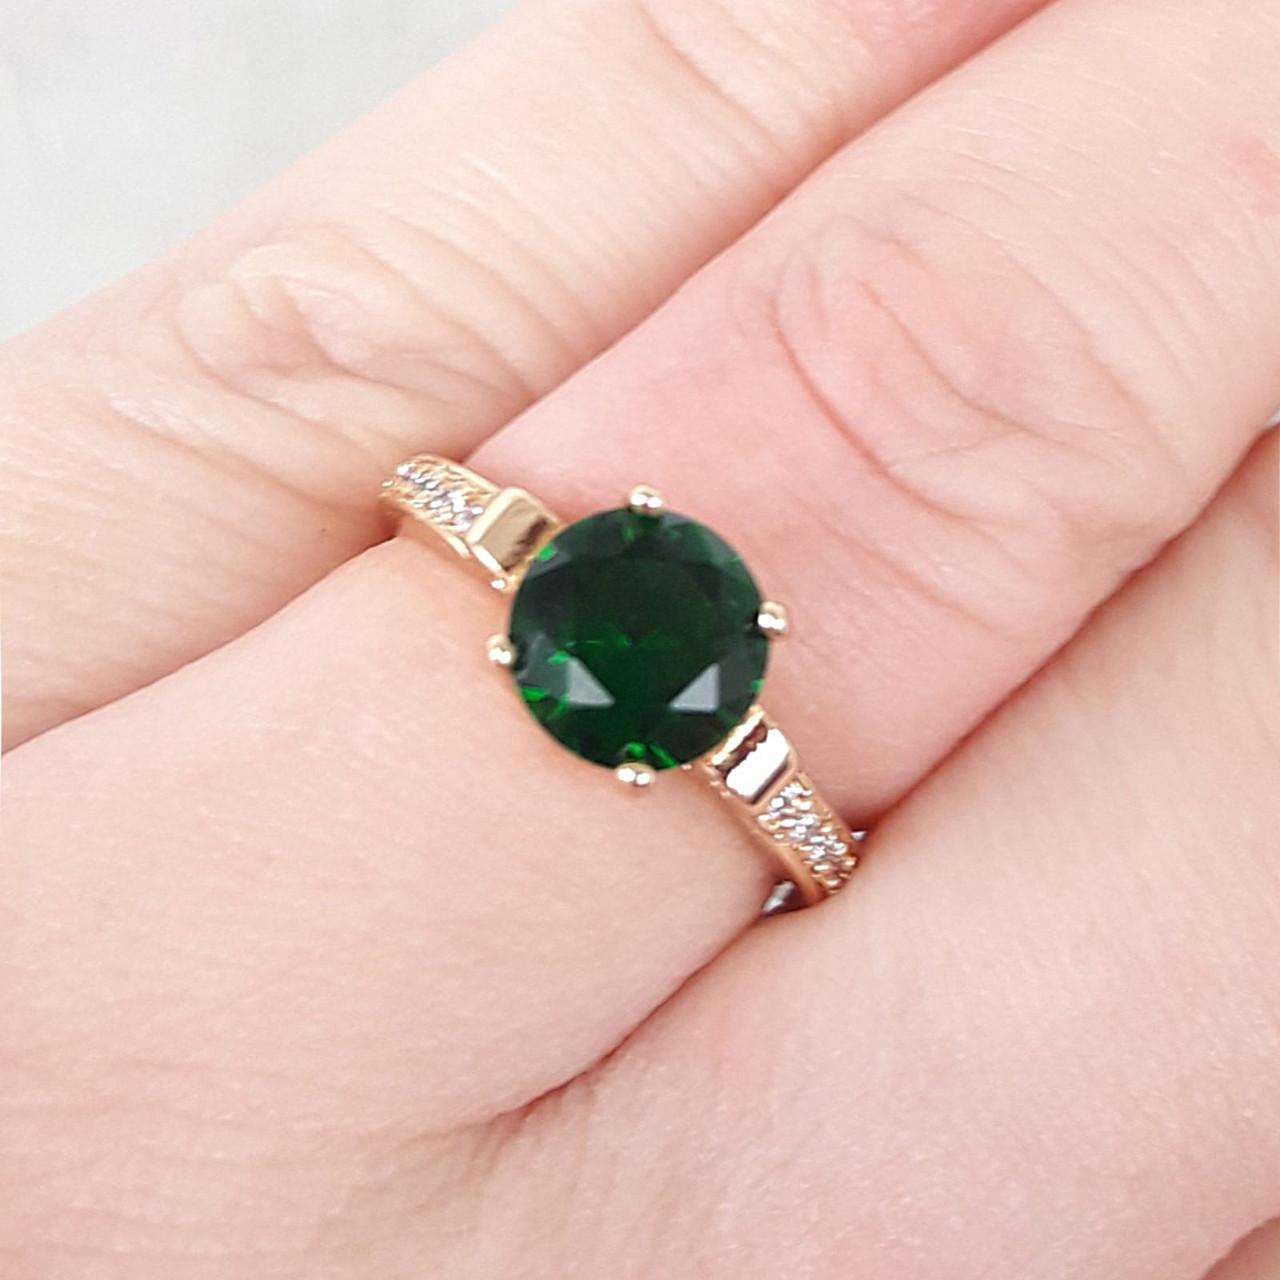 Кольцо 17р. 8мм xuping позолота 18К с зеленым цирконием медзолото8393